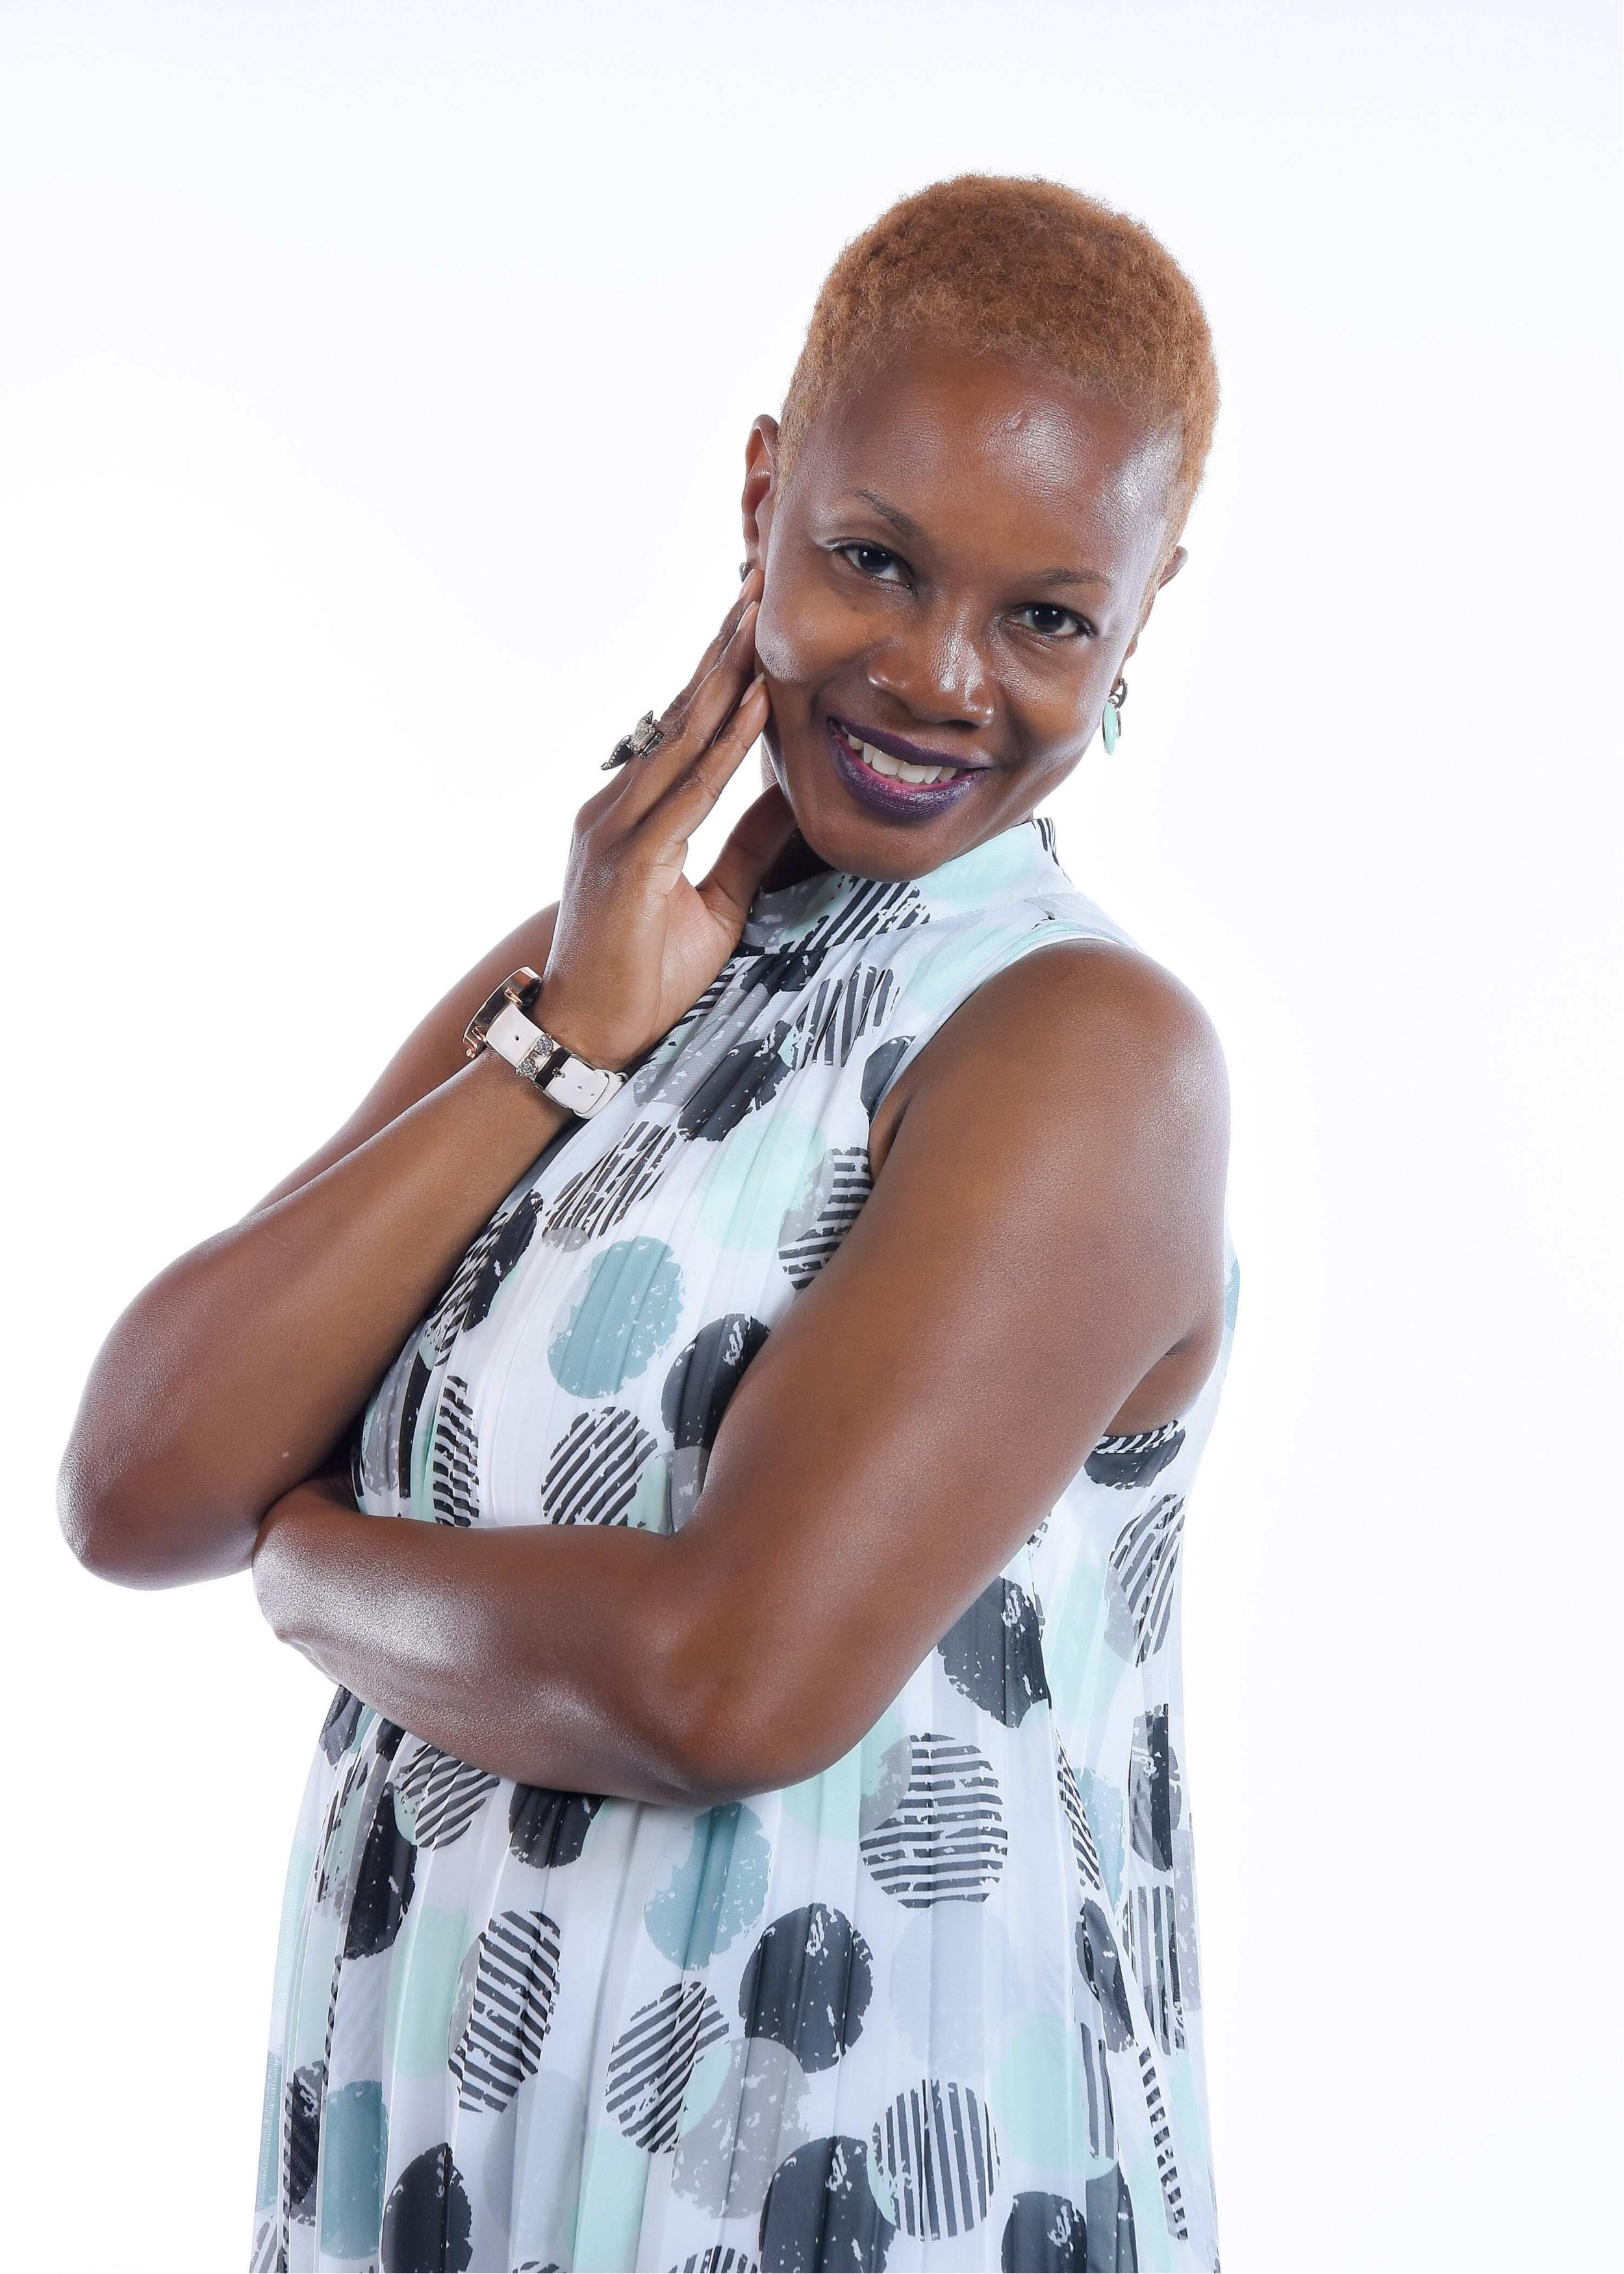 Vanessa Johnson, Global Influencer & CEO